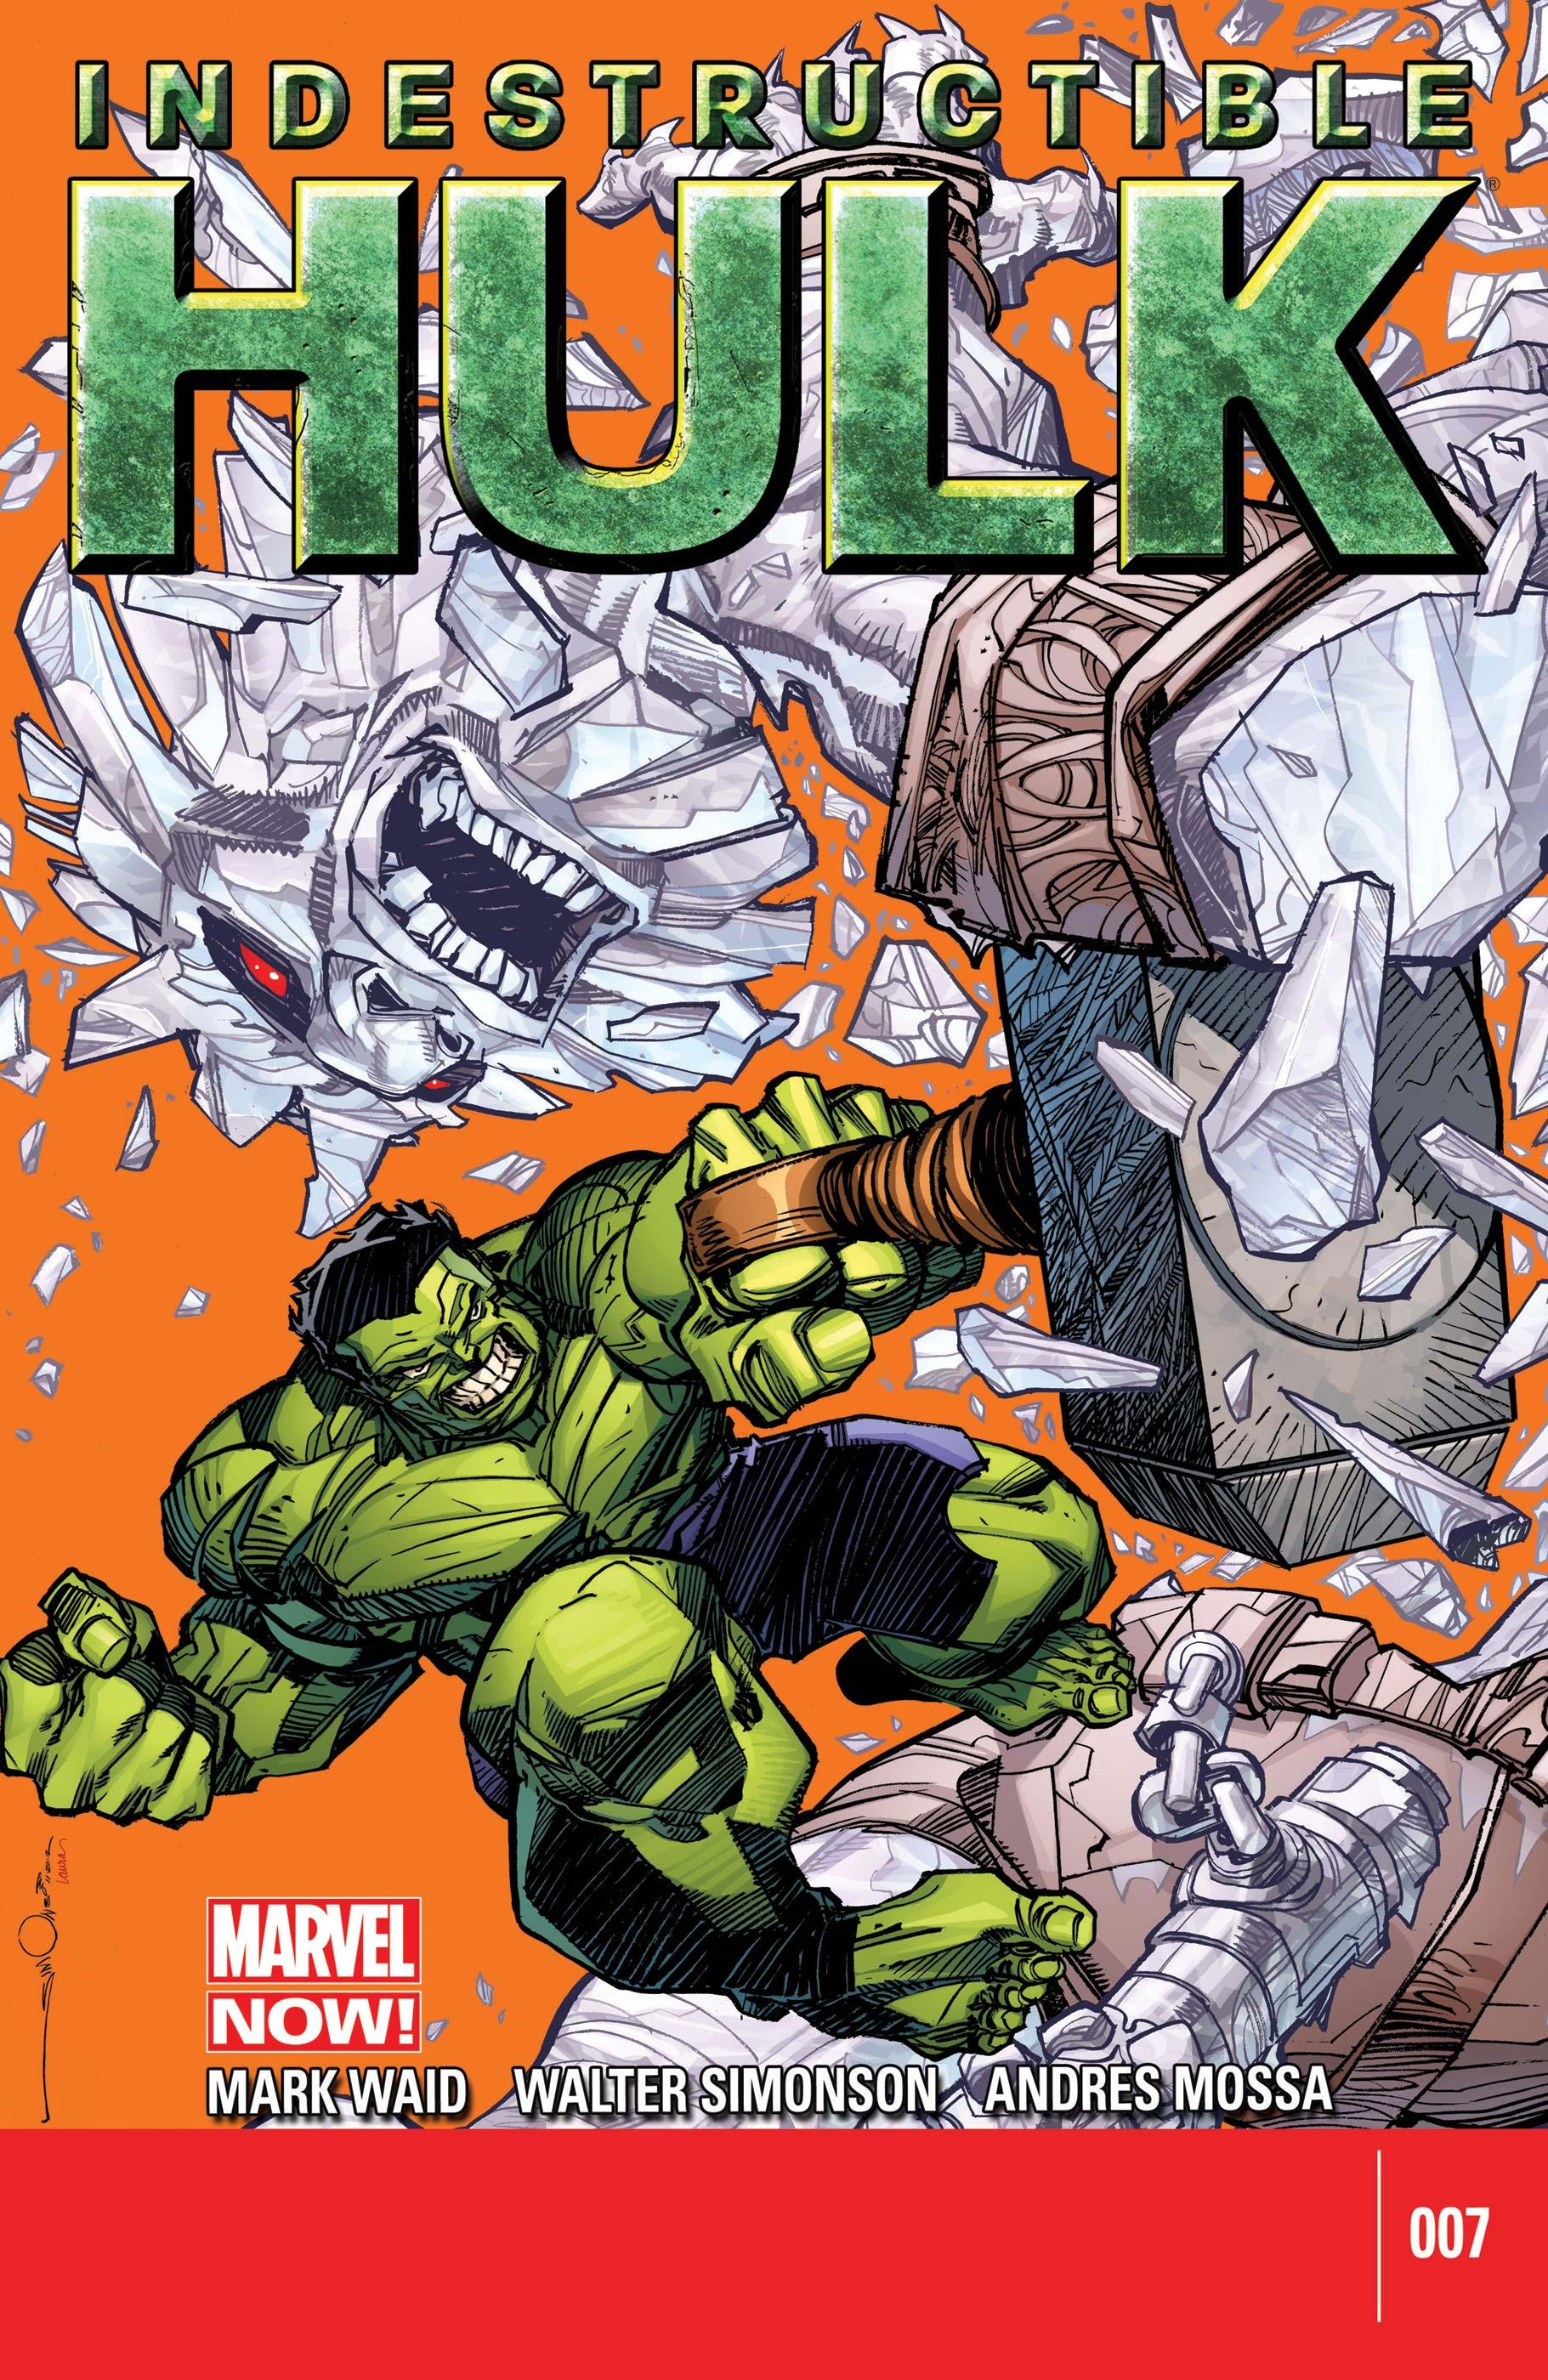 Indestructible Hulk (2012) #7